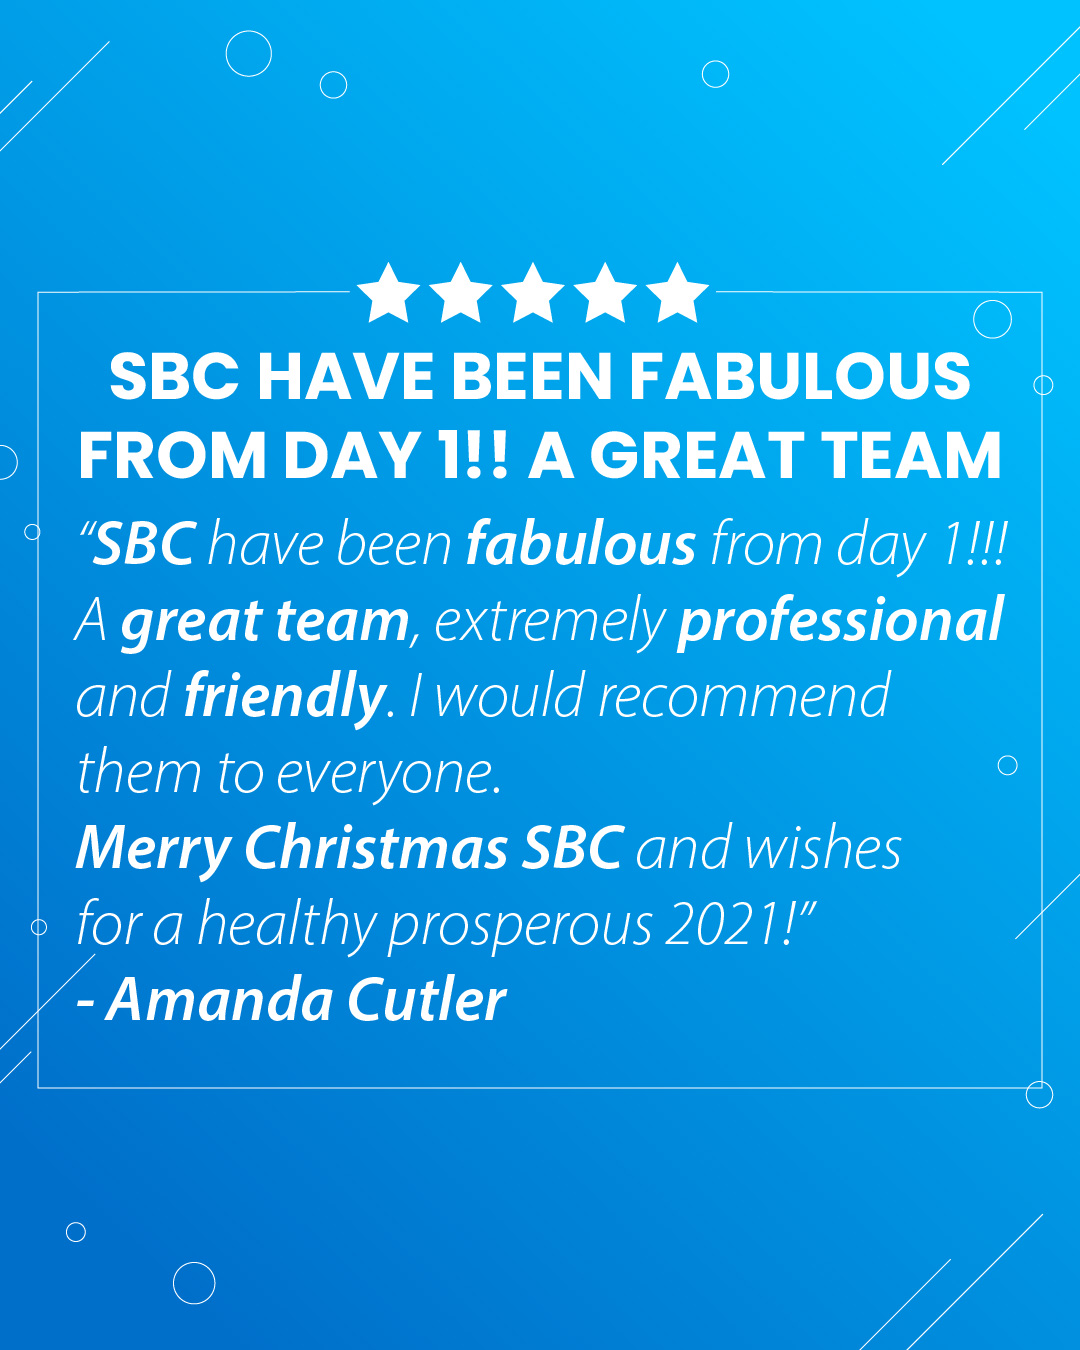 SBC Reviews: Amanda Cutler's 5-Star Review